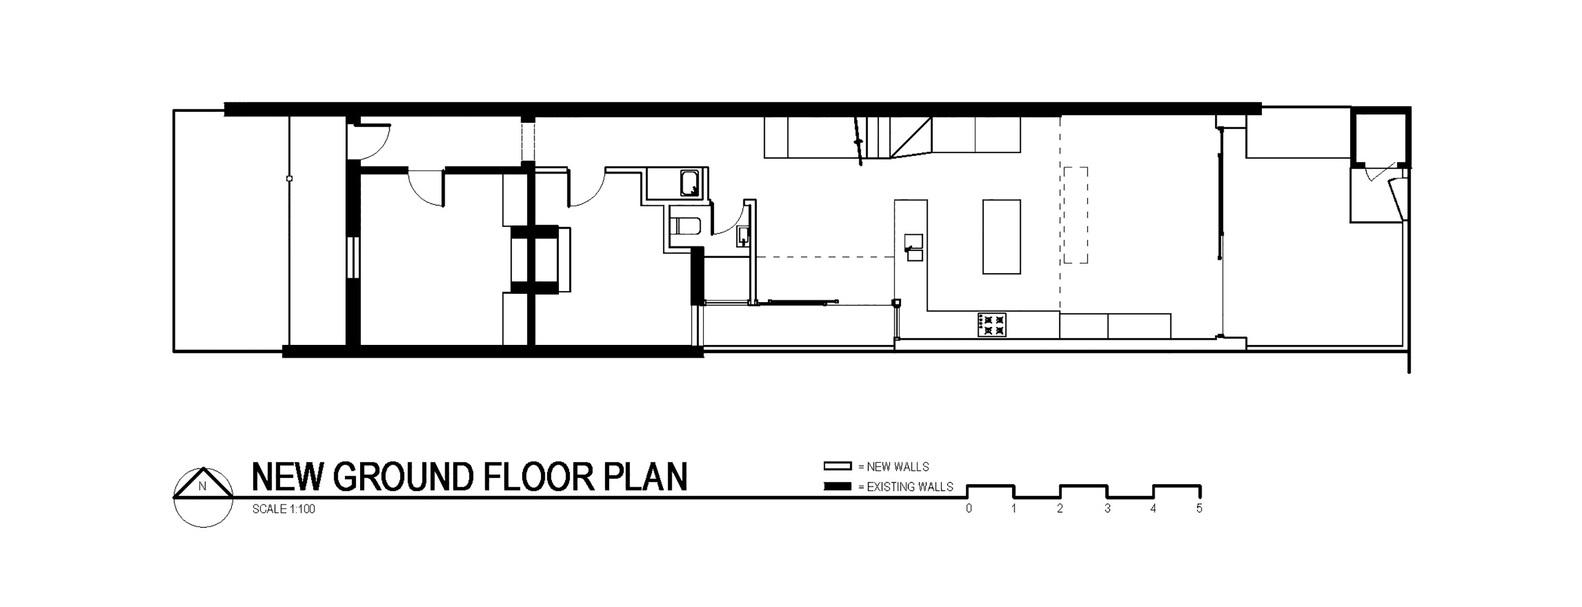 Wielki ma y dom nic owen architect awx2 blog for Little big house plans